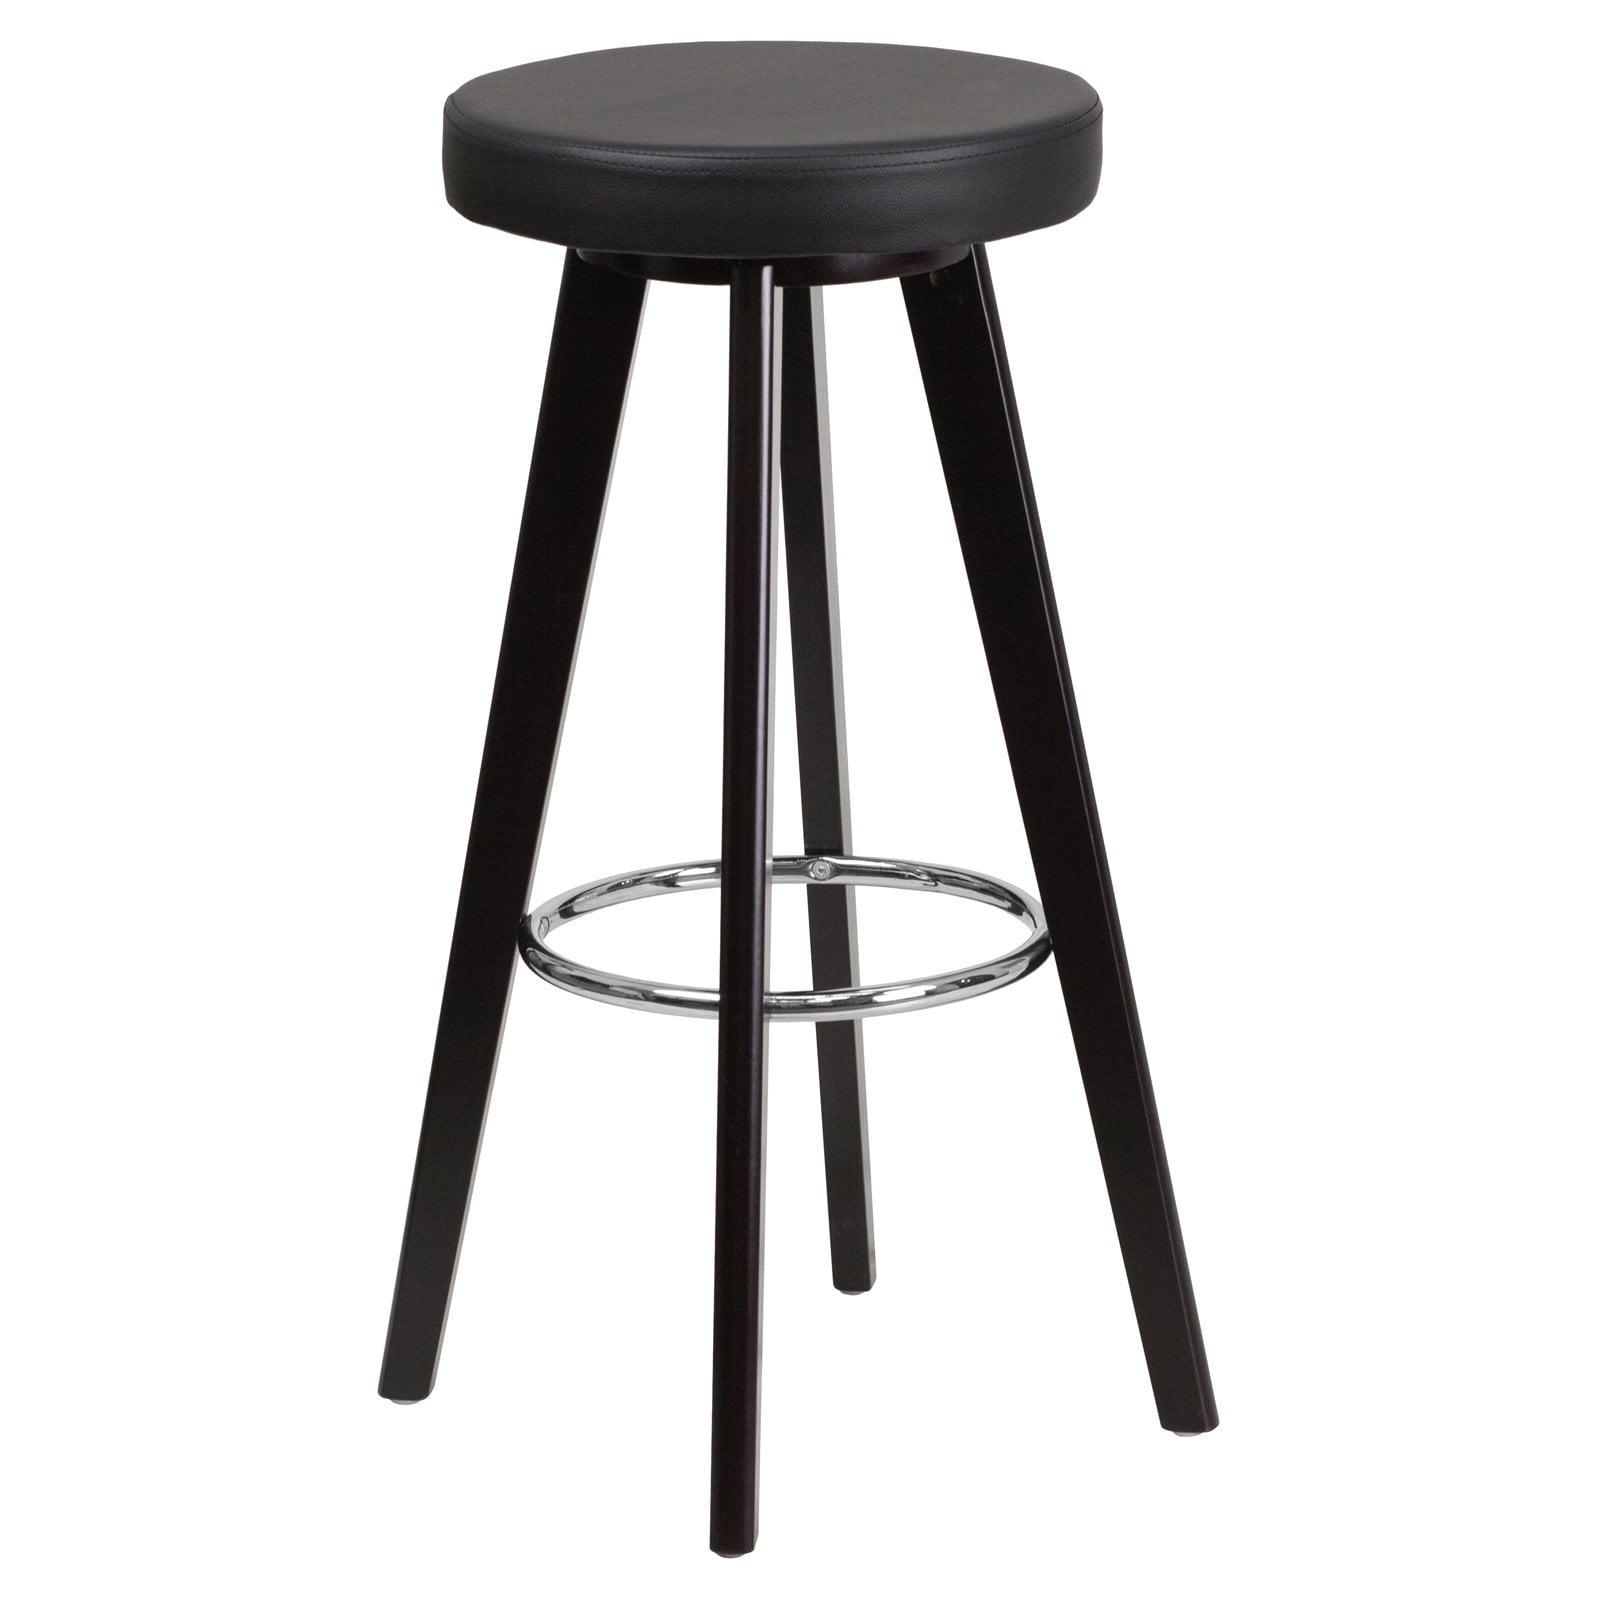 Flash Furniture Trenton 30 in. Contemporary Backless Legged Vinyl Bar Stool